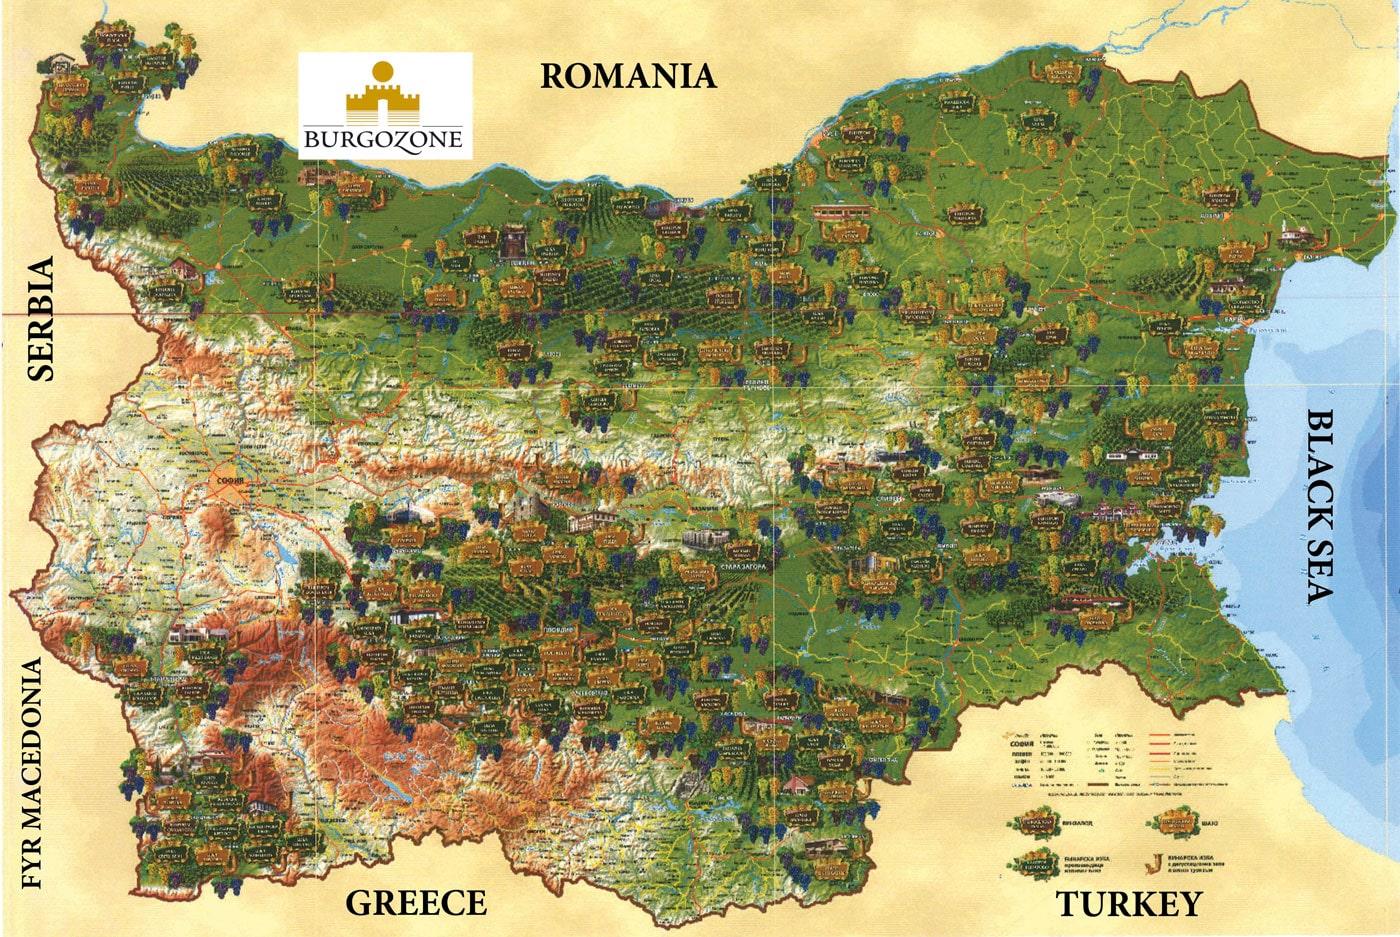 Burgozone Region